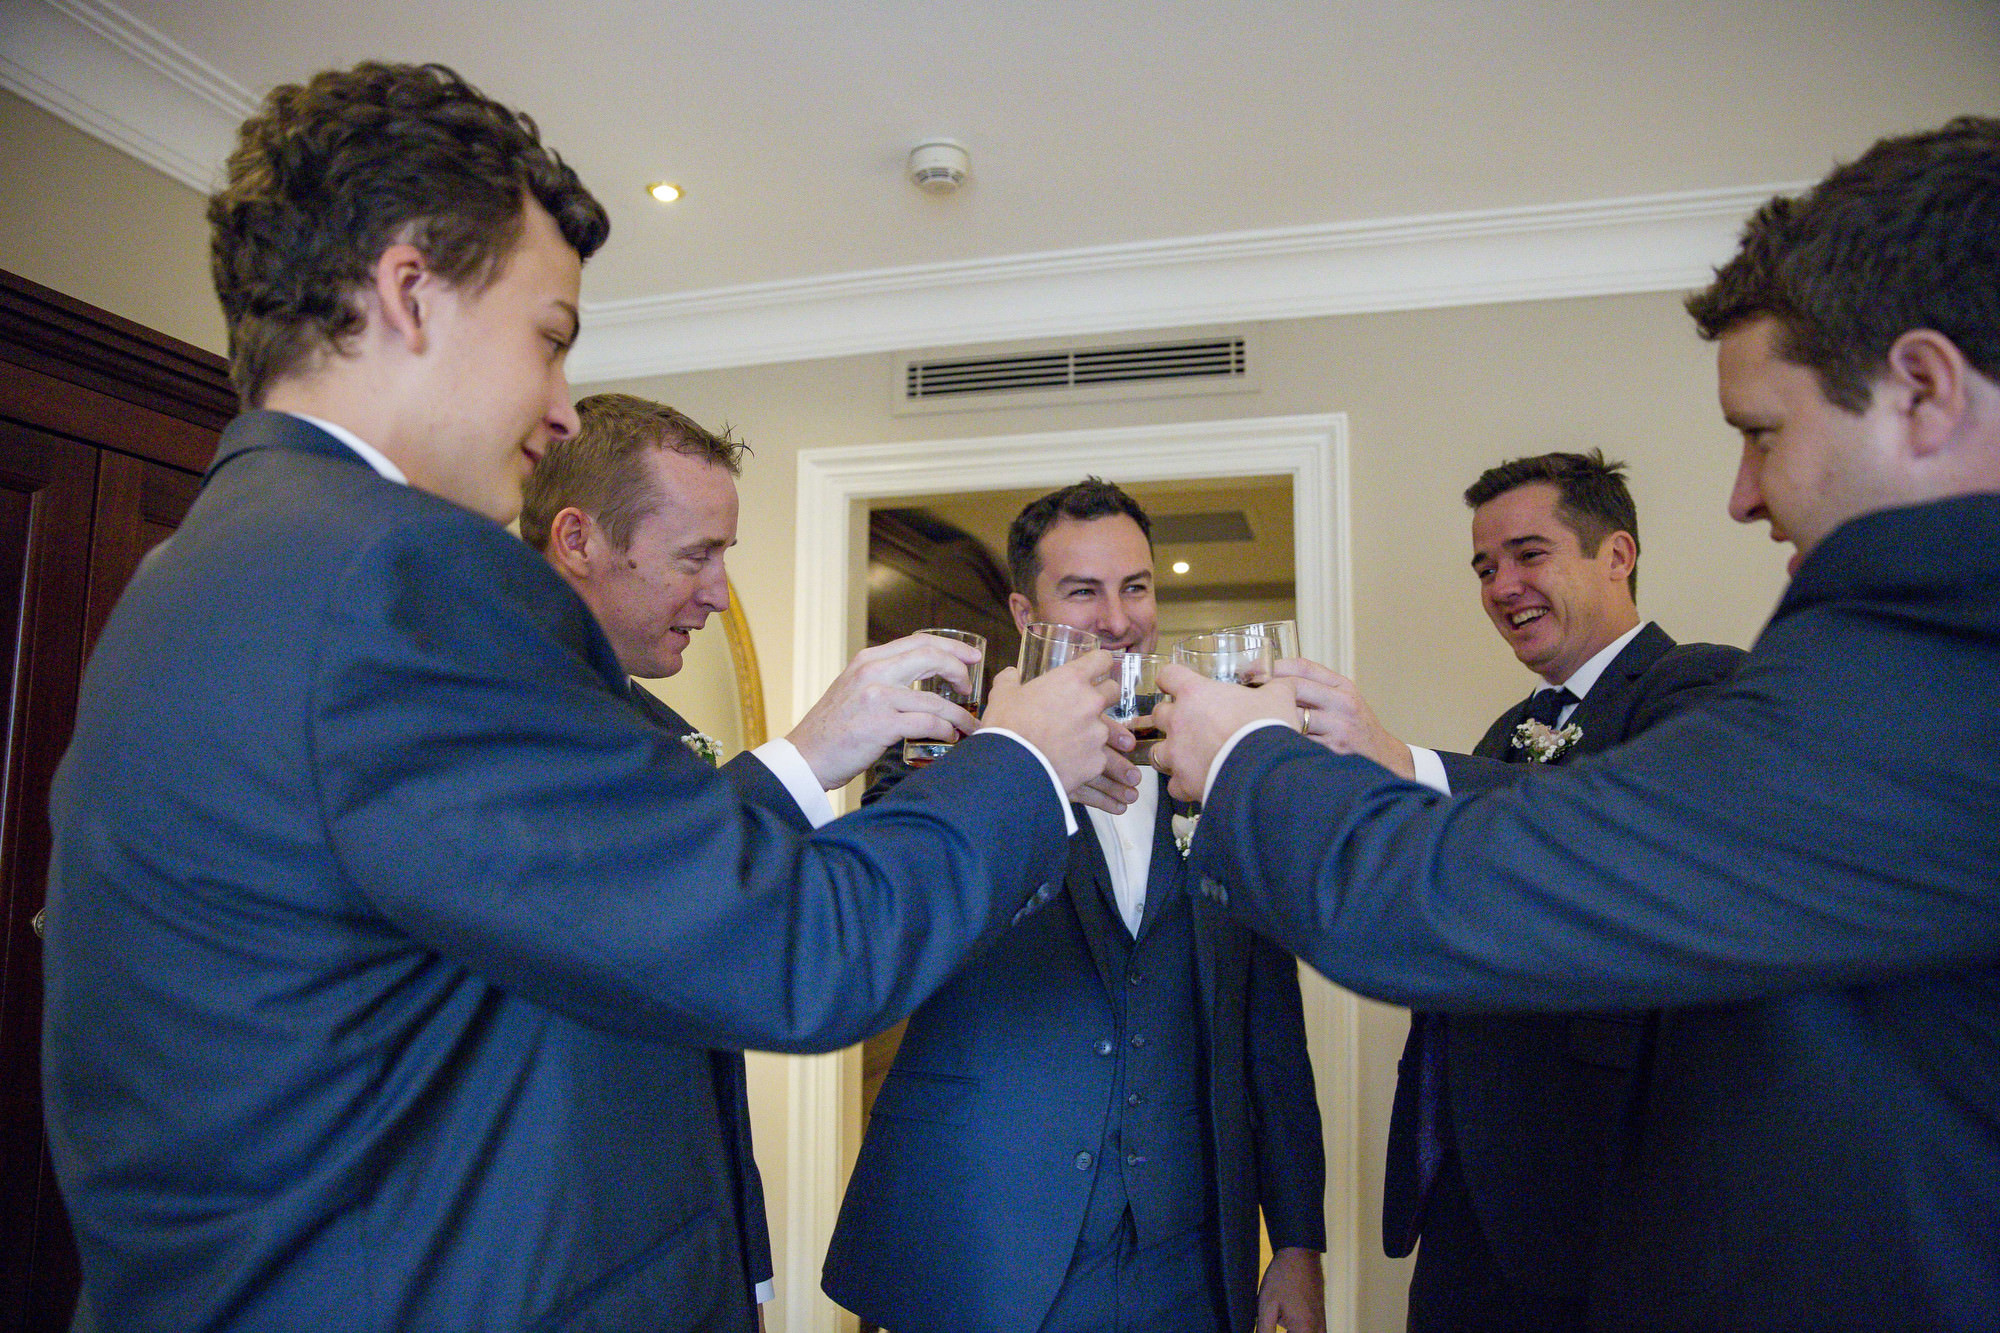 muckross_park_hotel_grougane_barra_wedding_photographer_goldenmoments_013.jpg